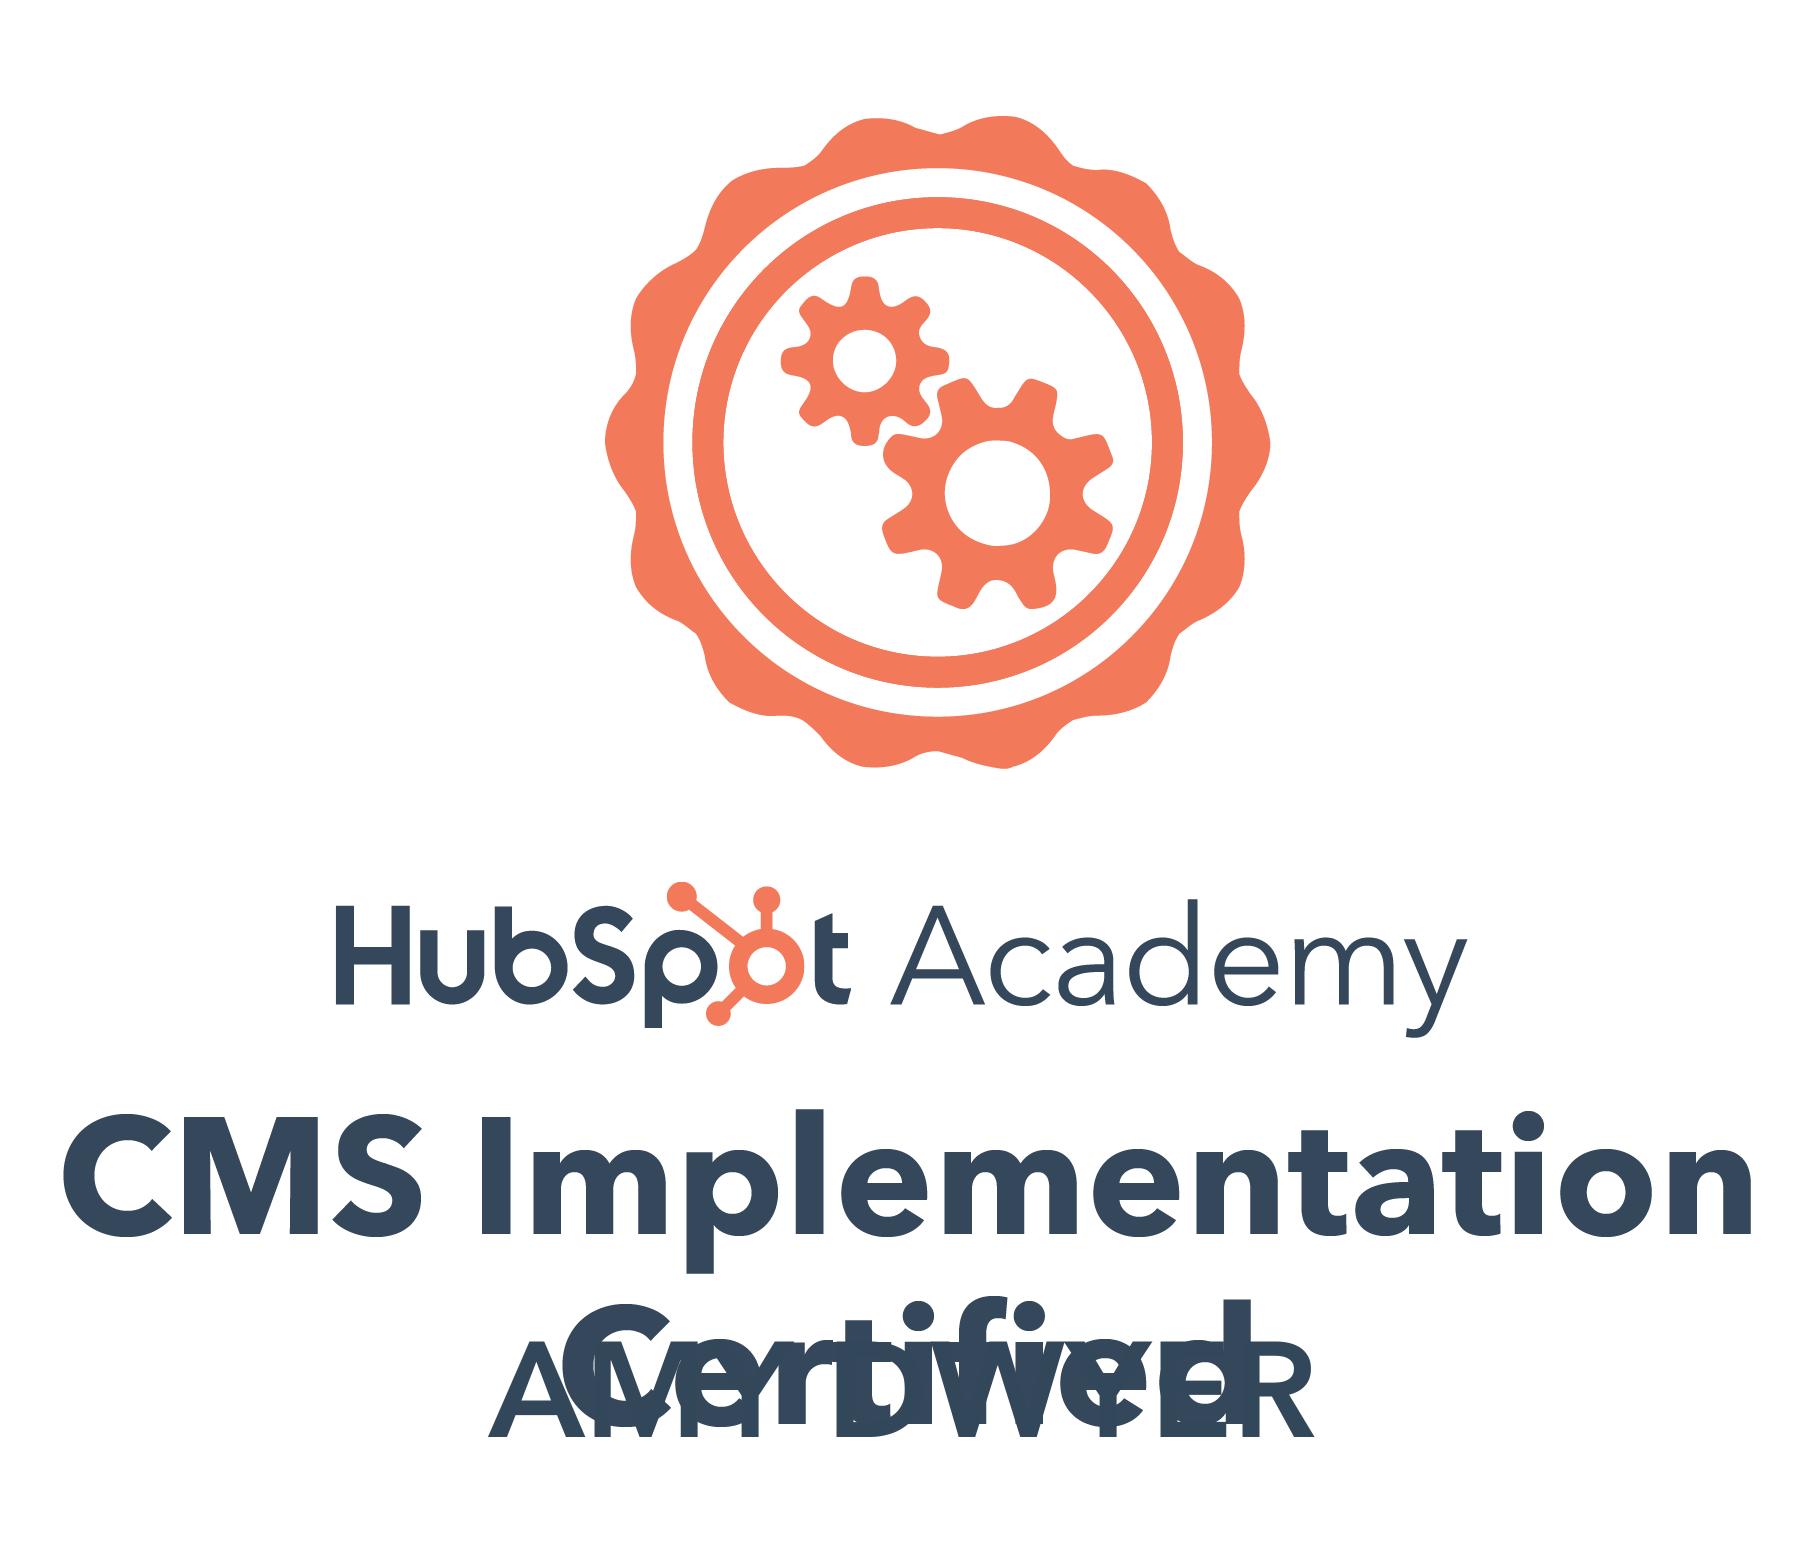 HubSpot CMS implementation certified Amy Dwyer